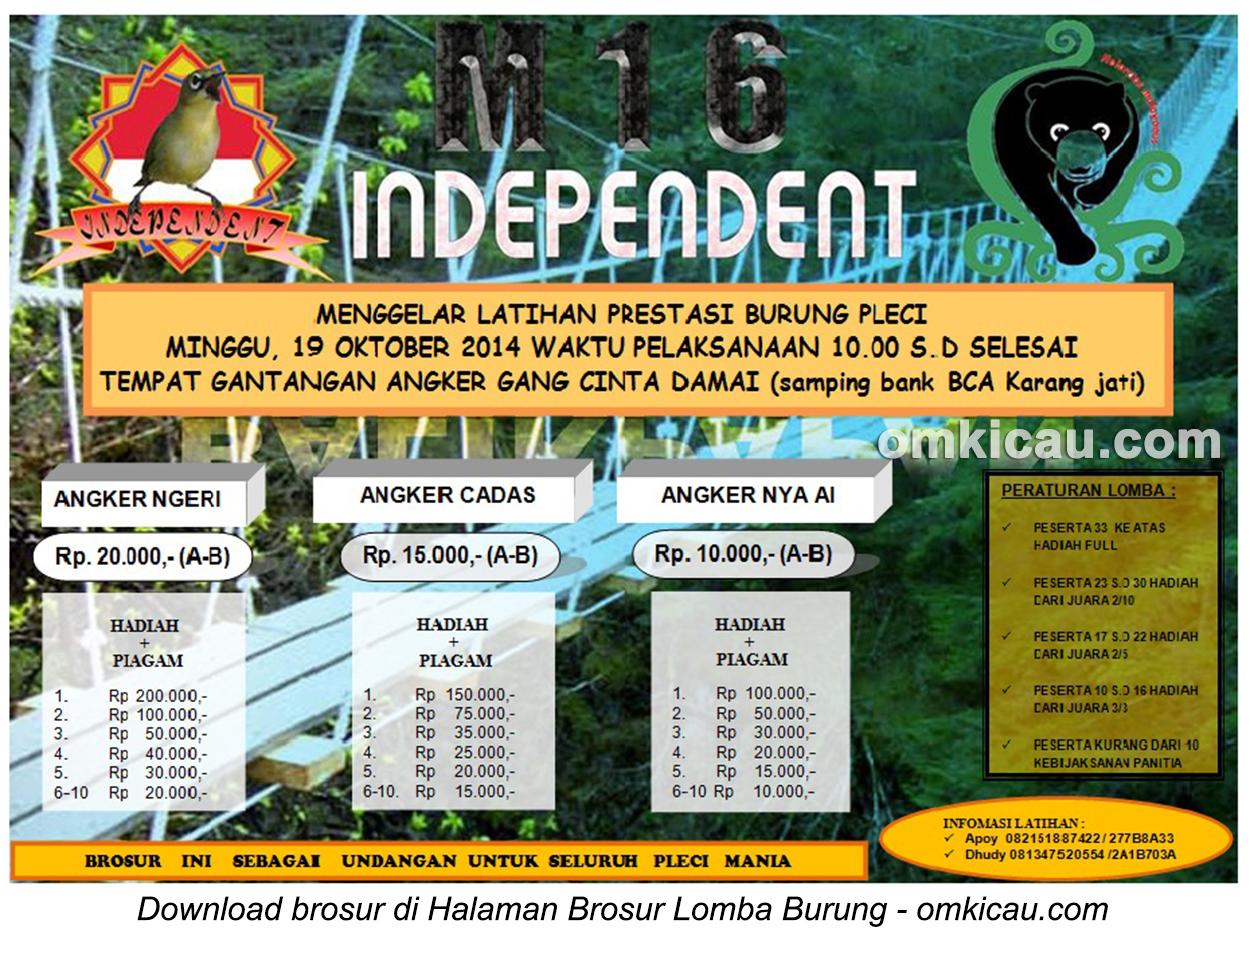 Brosur Latpres Burung Pleci M16 Independent, Balikpapan, 19 Oktober 2014